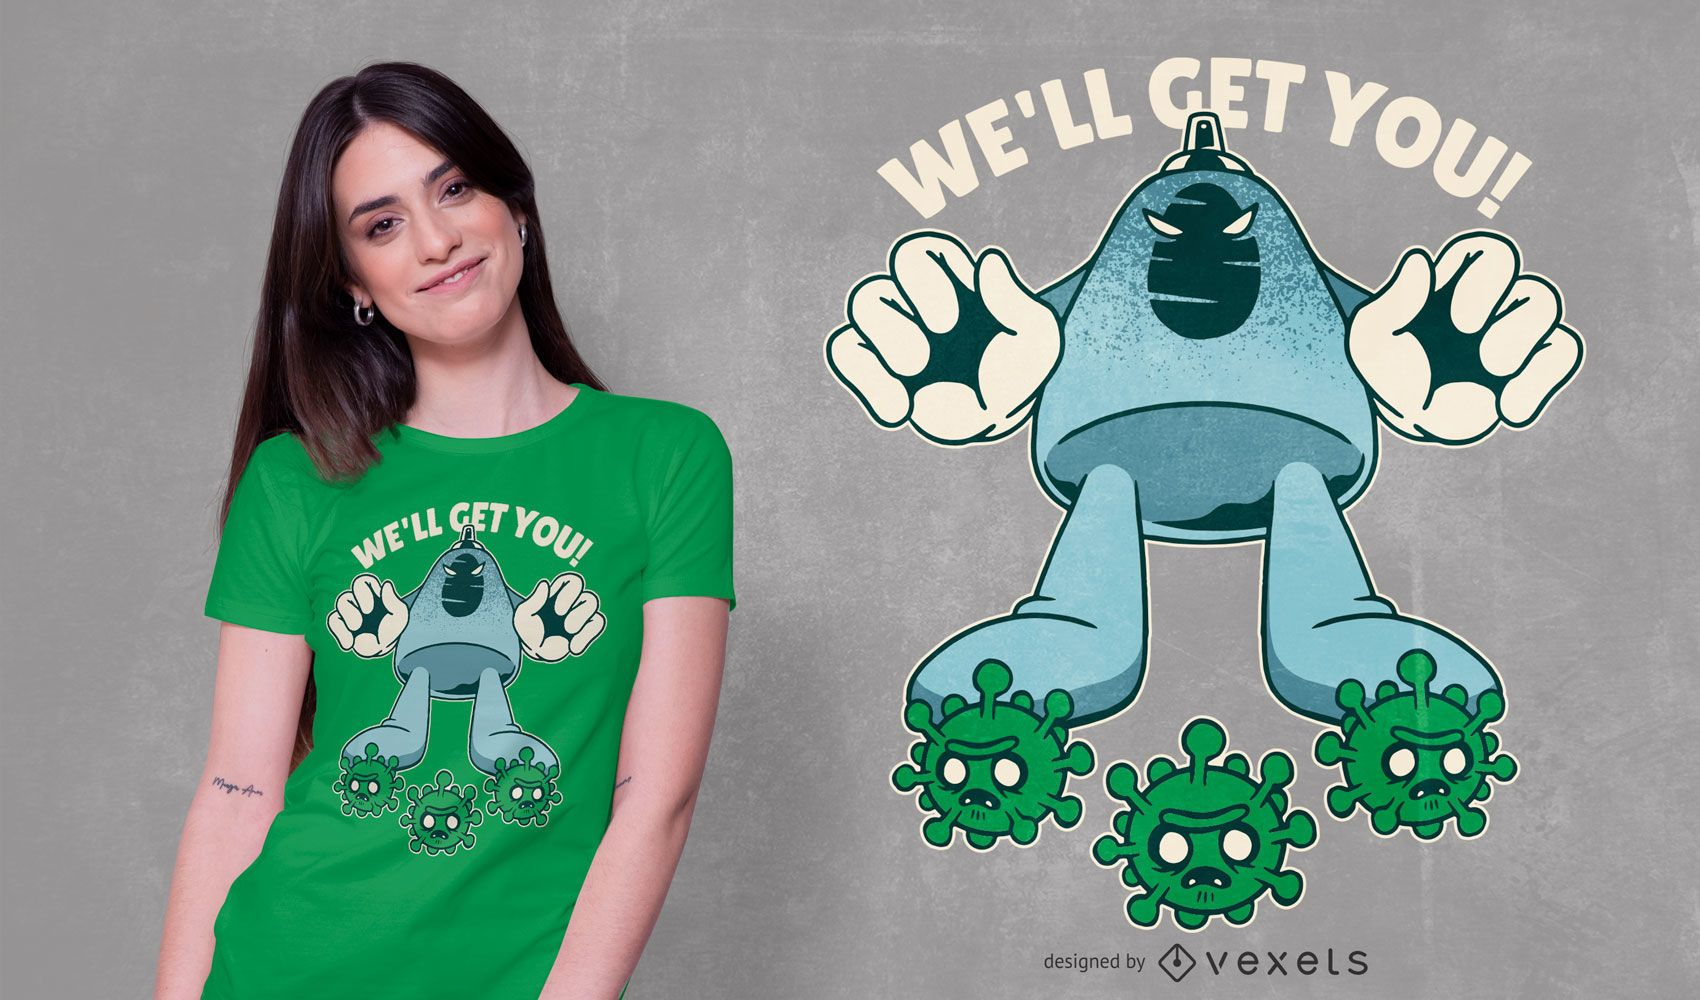 Hand Sanitizer Quote T-shirt Design